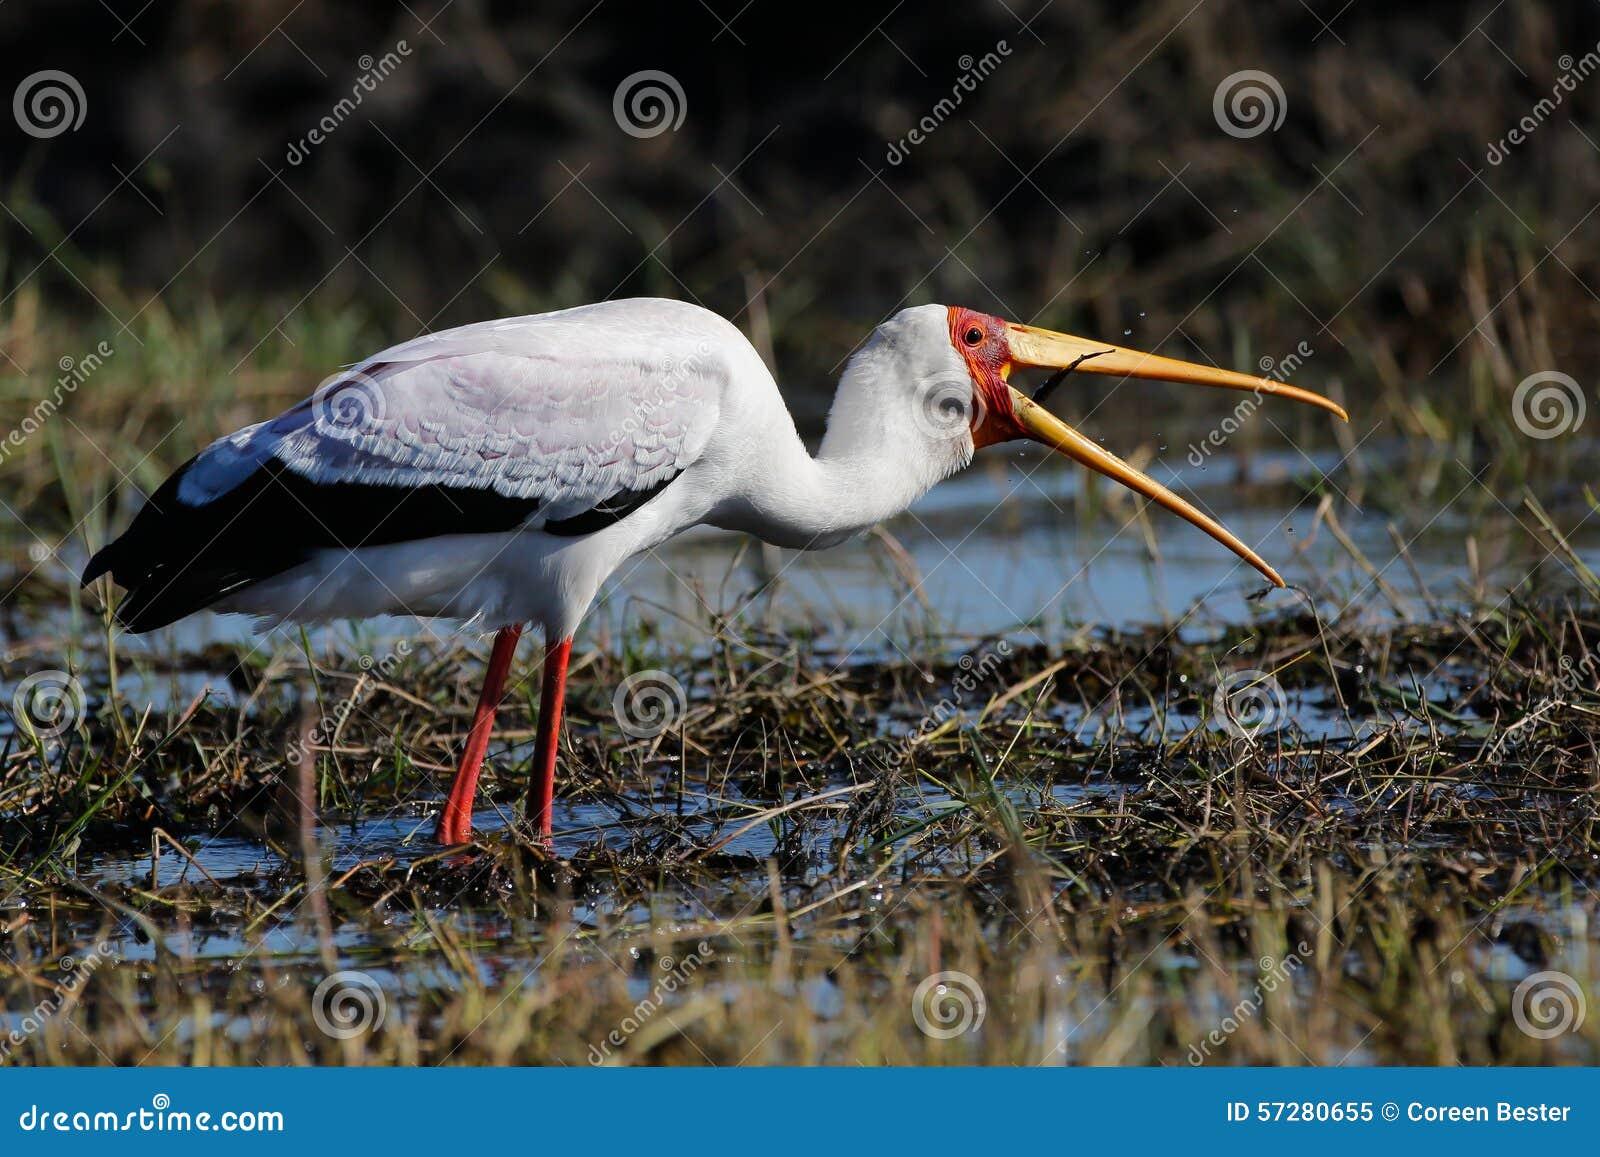 Africa Wild Bird Coming To Land Stock Photo - Image: 57280655